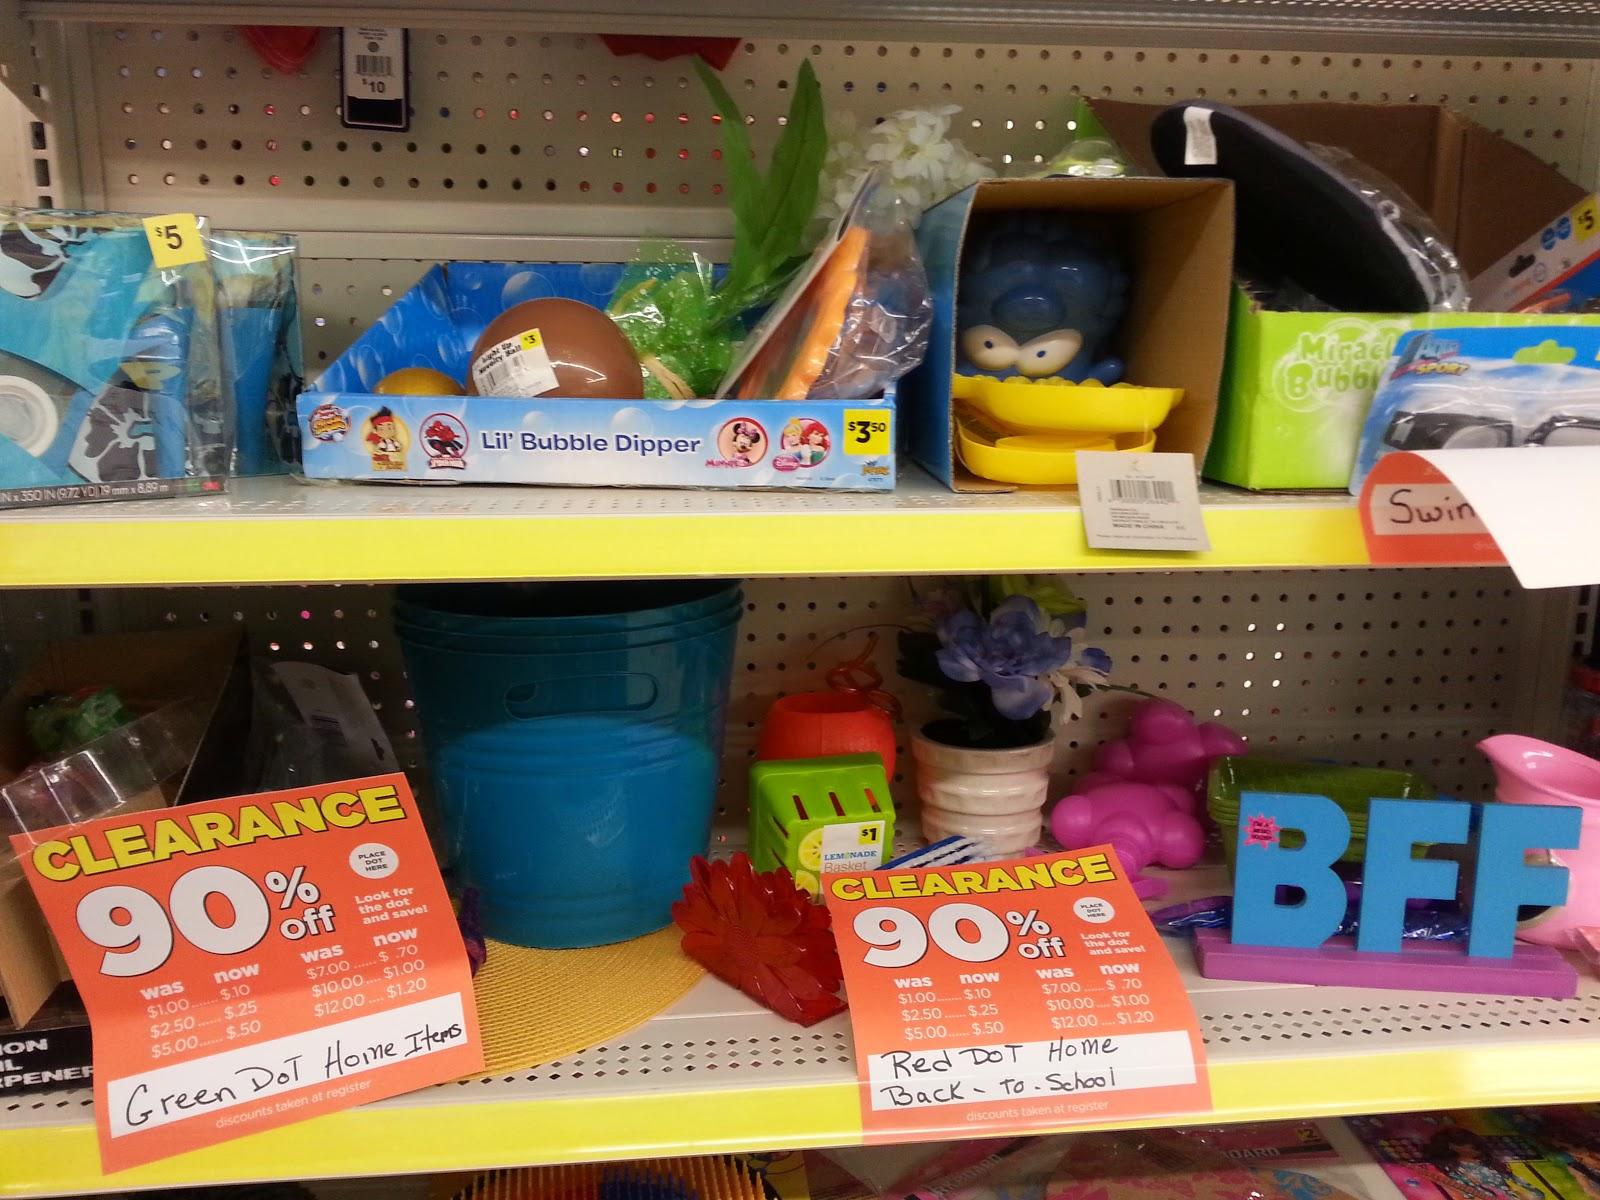 Rummage Sale, Thrifty Finds & Deals